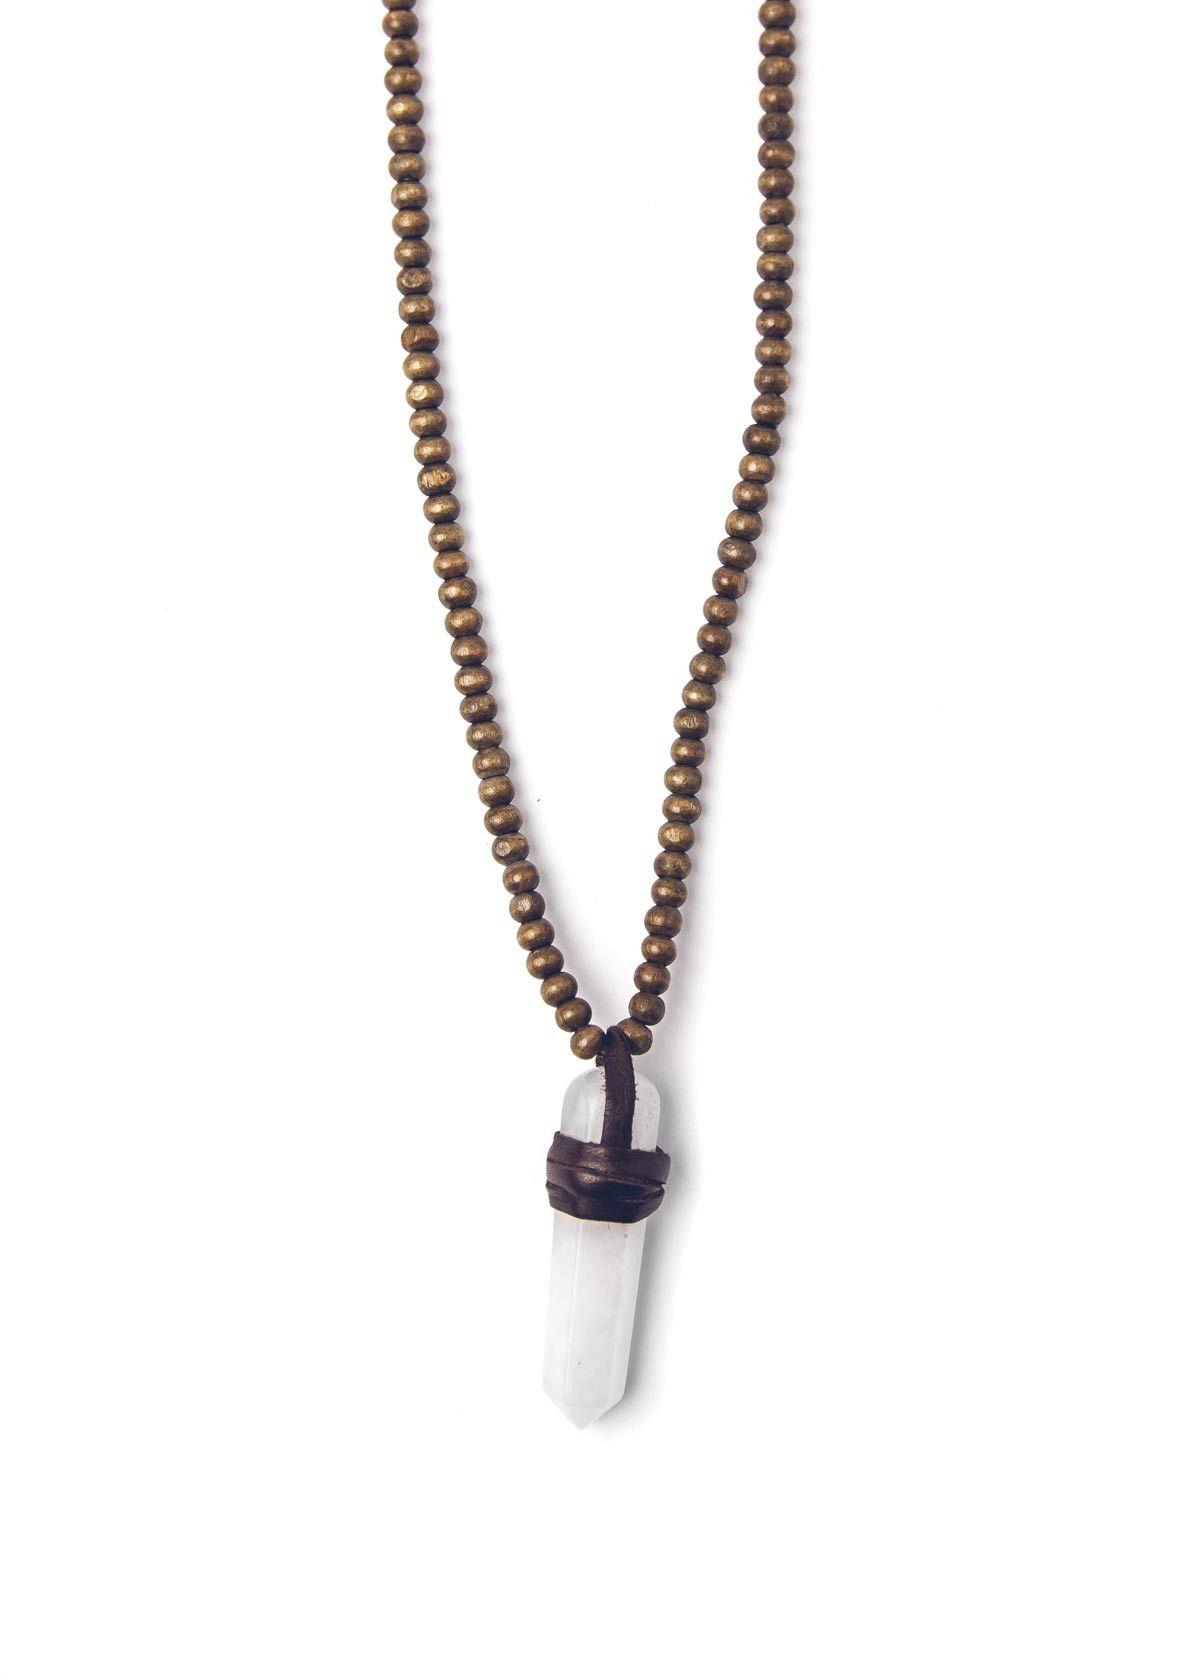 Foxy Lady Necklace | Quartz Crystal Pendant Necklace | Bohemian Jewelry by SoulMakes #jewelry #necklace #soulmakes